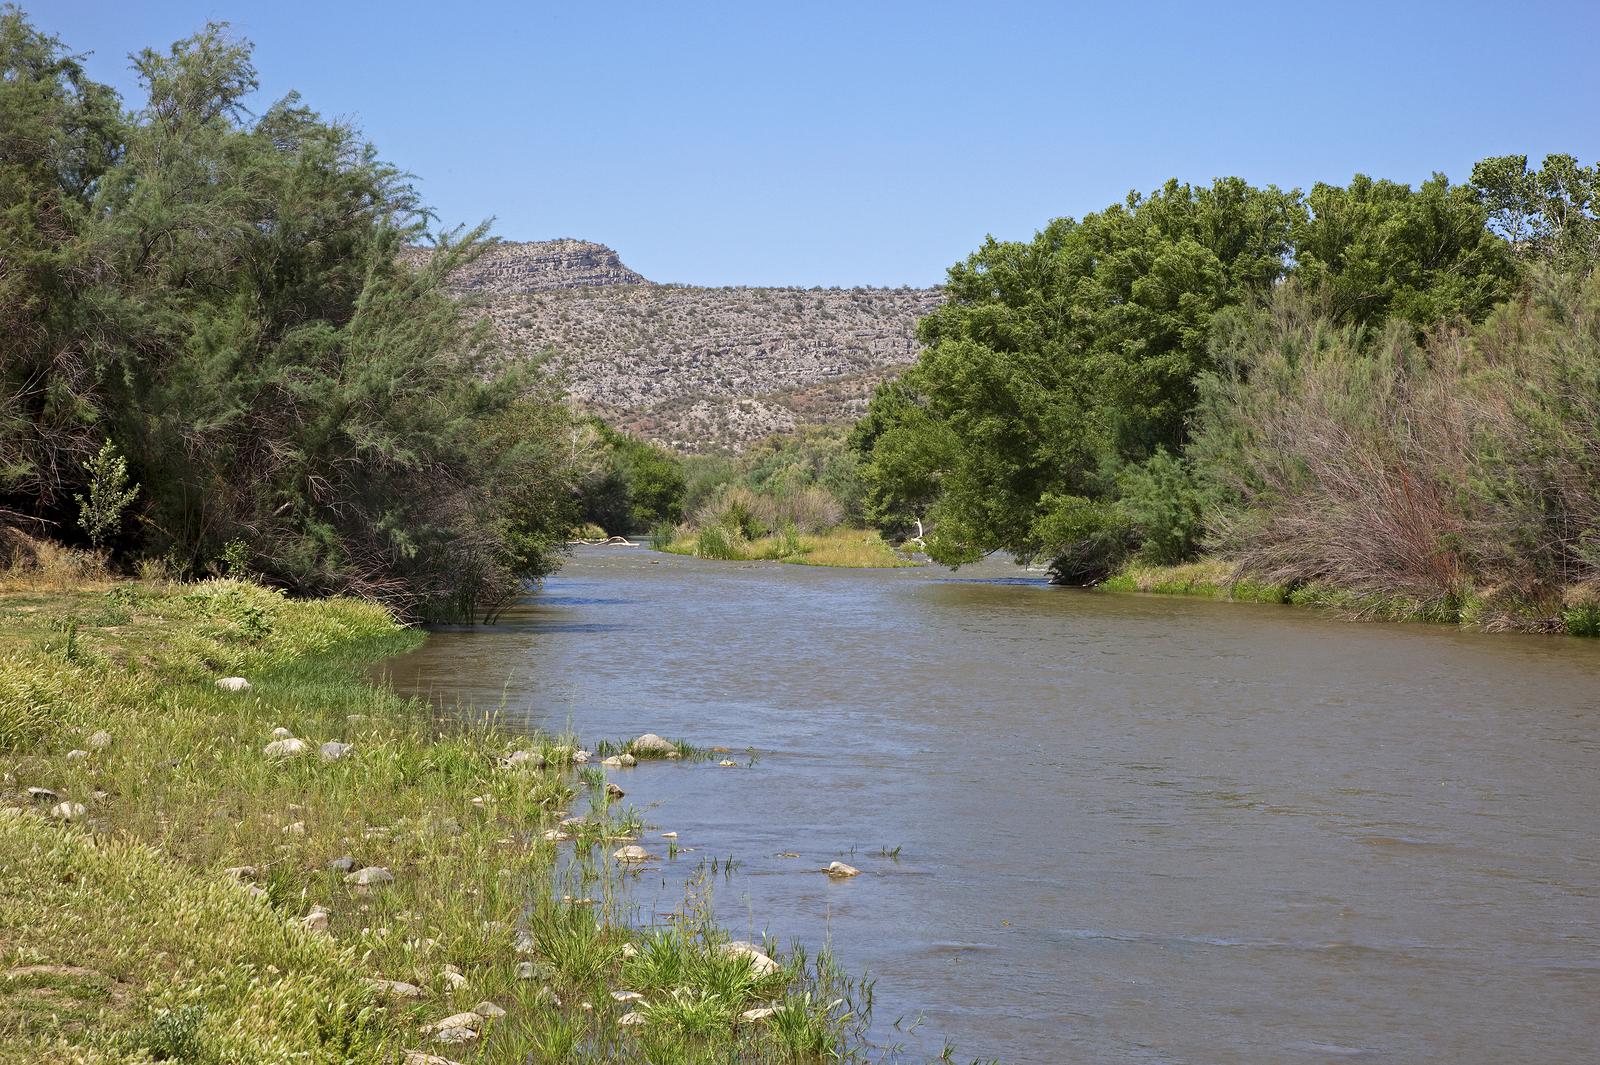 Gila River flowing at Winkelman Flats, Arizona